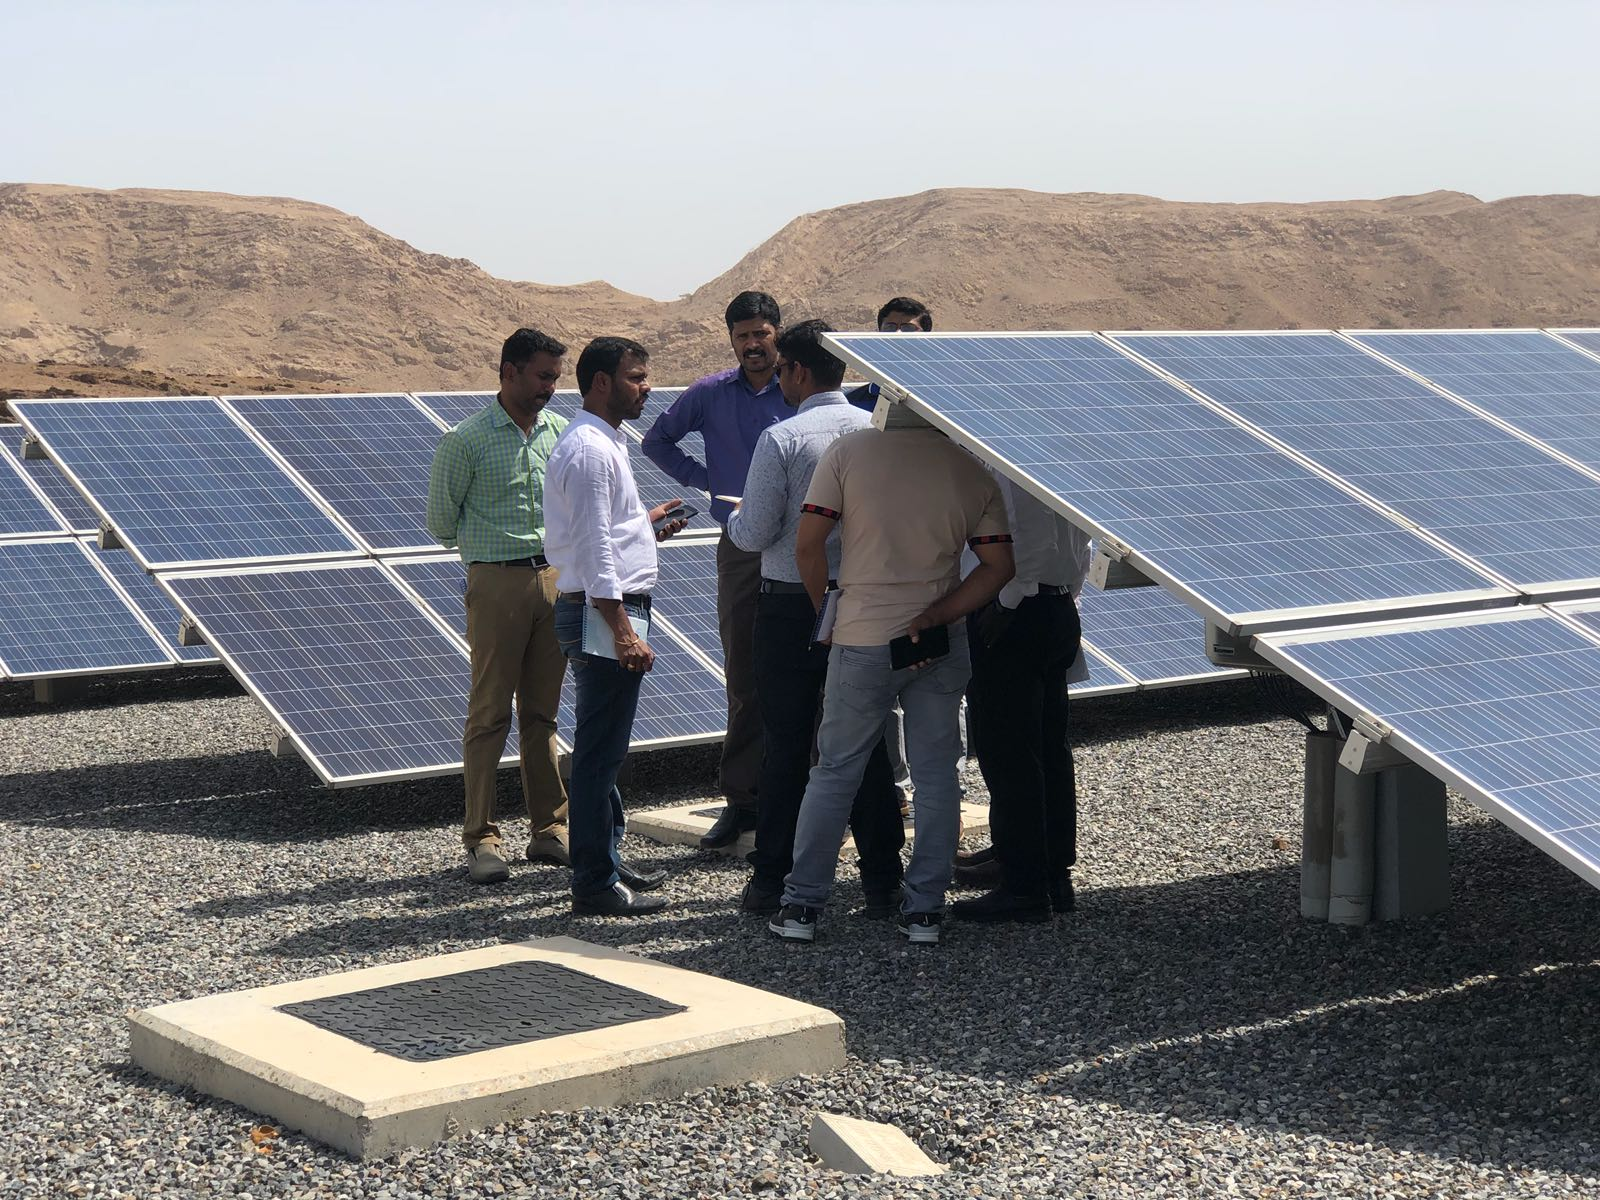 Solar Energy International And Shams Global Solutions Leaders Of Solar Training In Oman Solar Training Solar Installer Training Solar Pv Installation Training Solar Energy Courses Renewable Energy